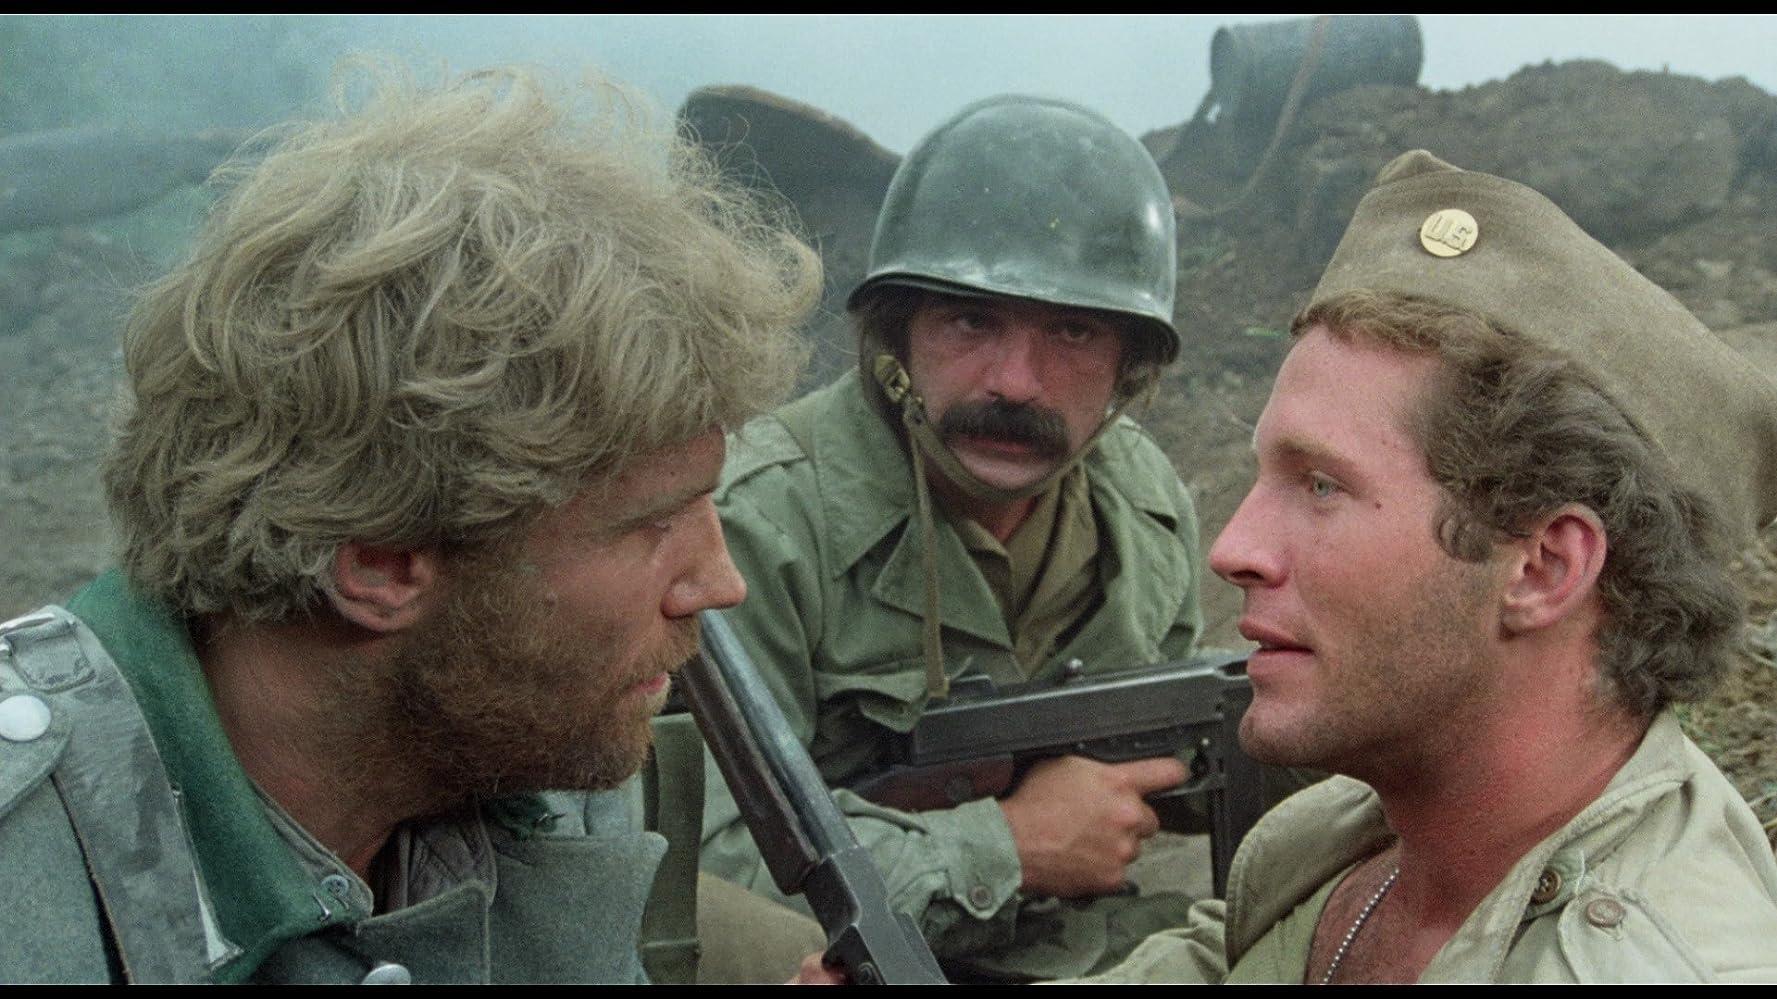 Raimund Harmstorf, Peter Hooten, and Michael Pergolani in Quel maledetto treno blindato (1978)